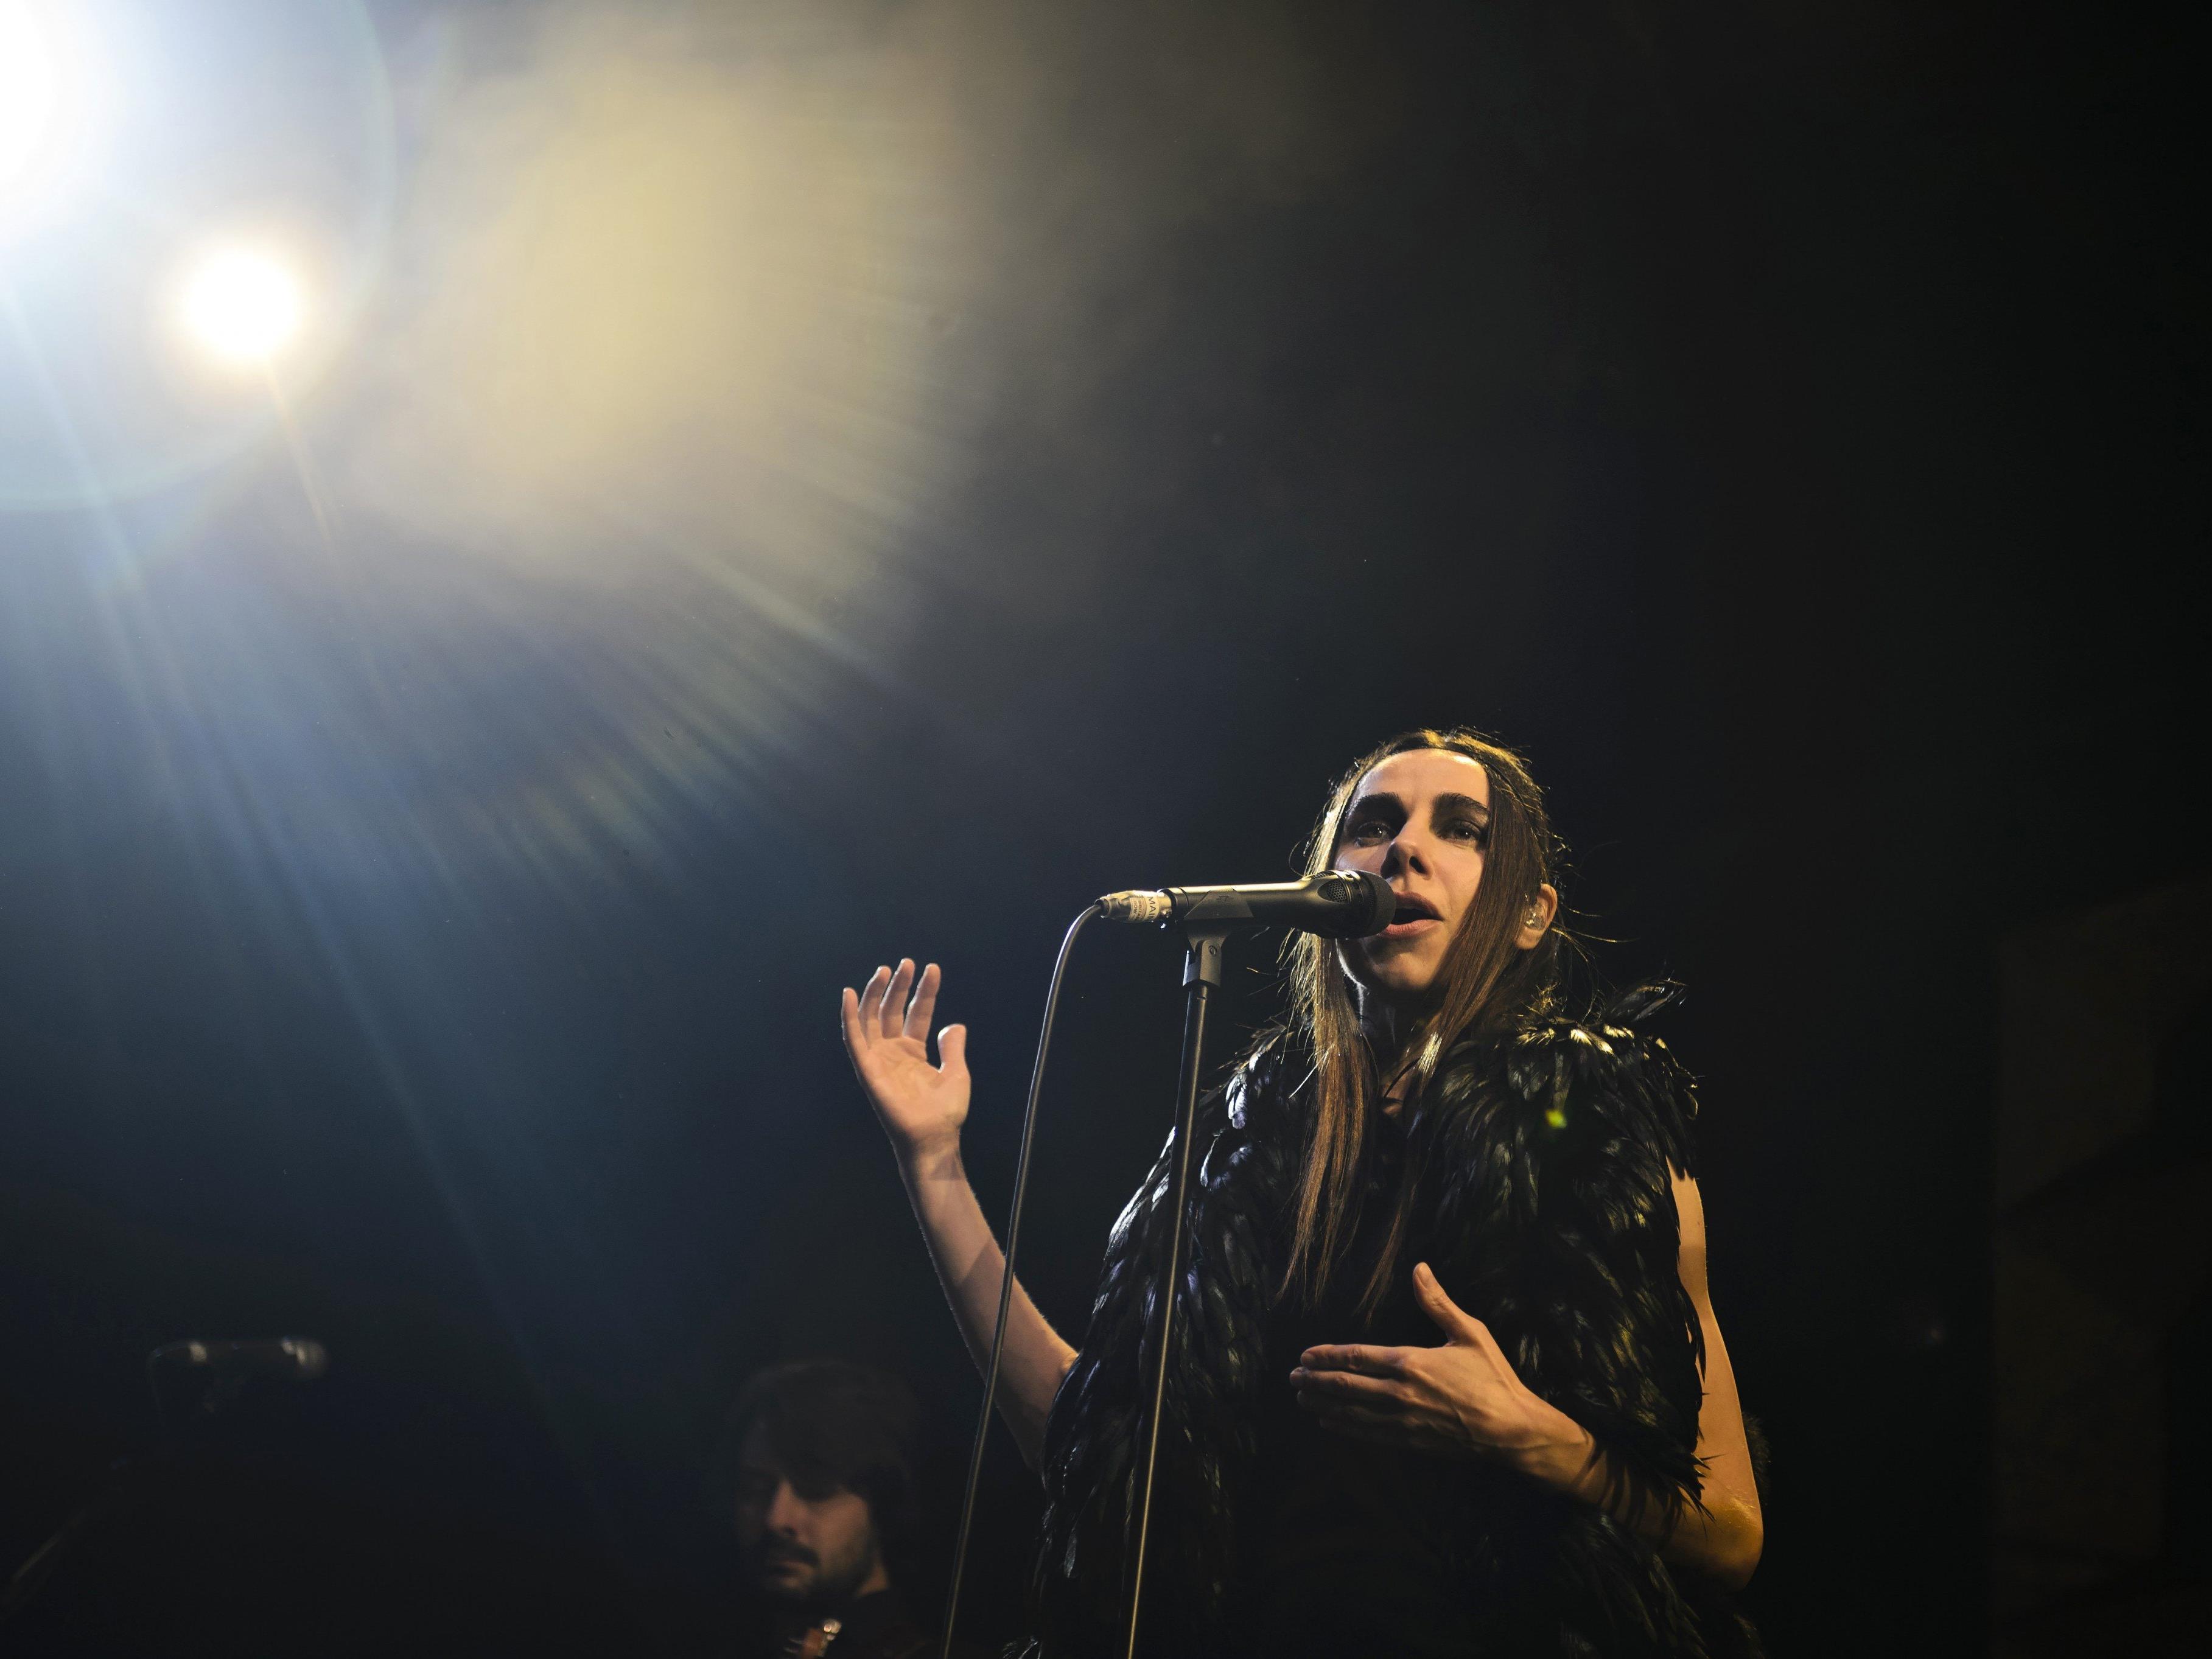 Marschkapelle und Gesellschaftskritik: PJ Harvey begeisterte in Wien